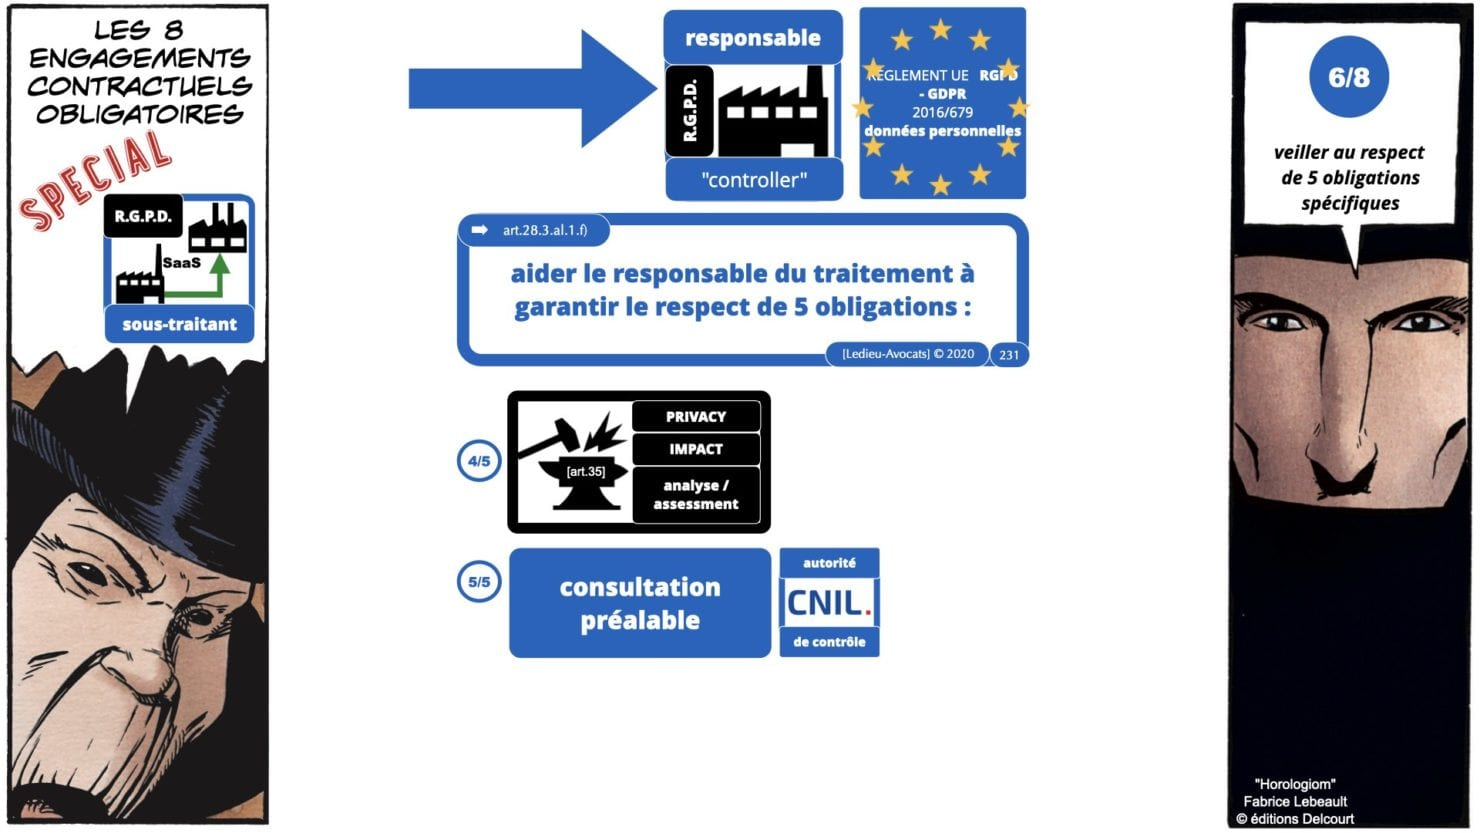 RGPD e-Privacy principes actualité jurisprudence ©Ledieu-Avocats 25-06-2021.231